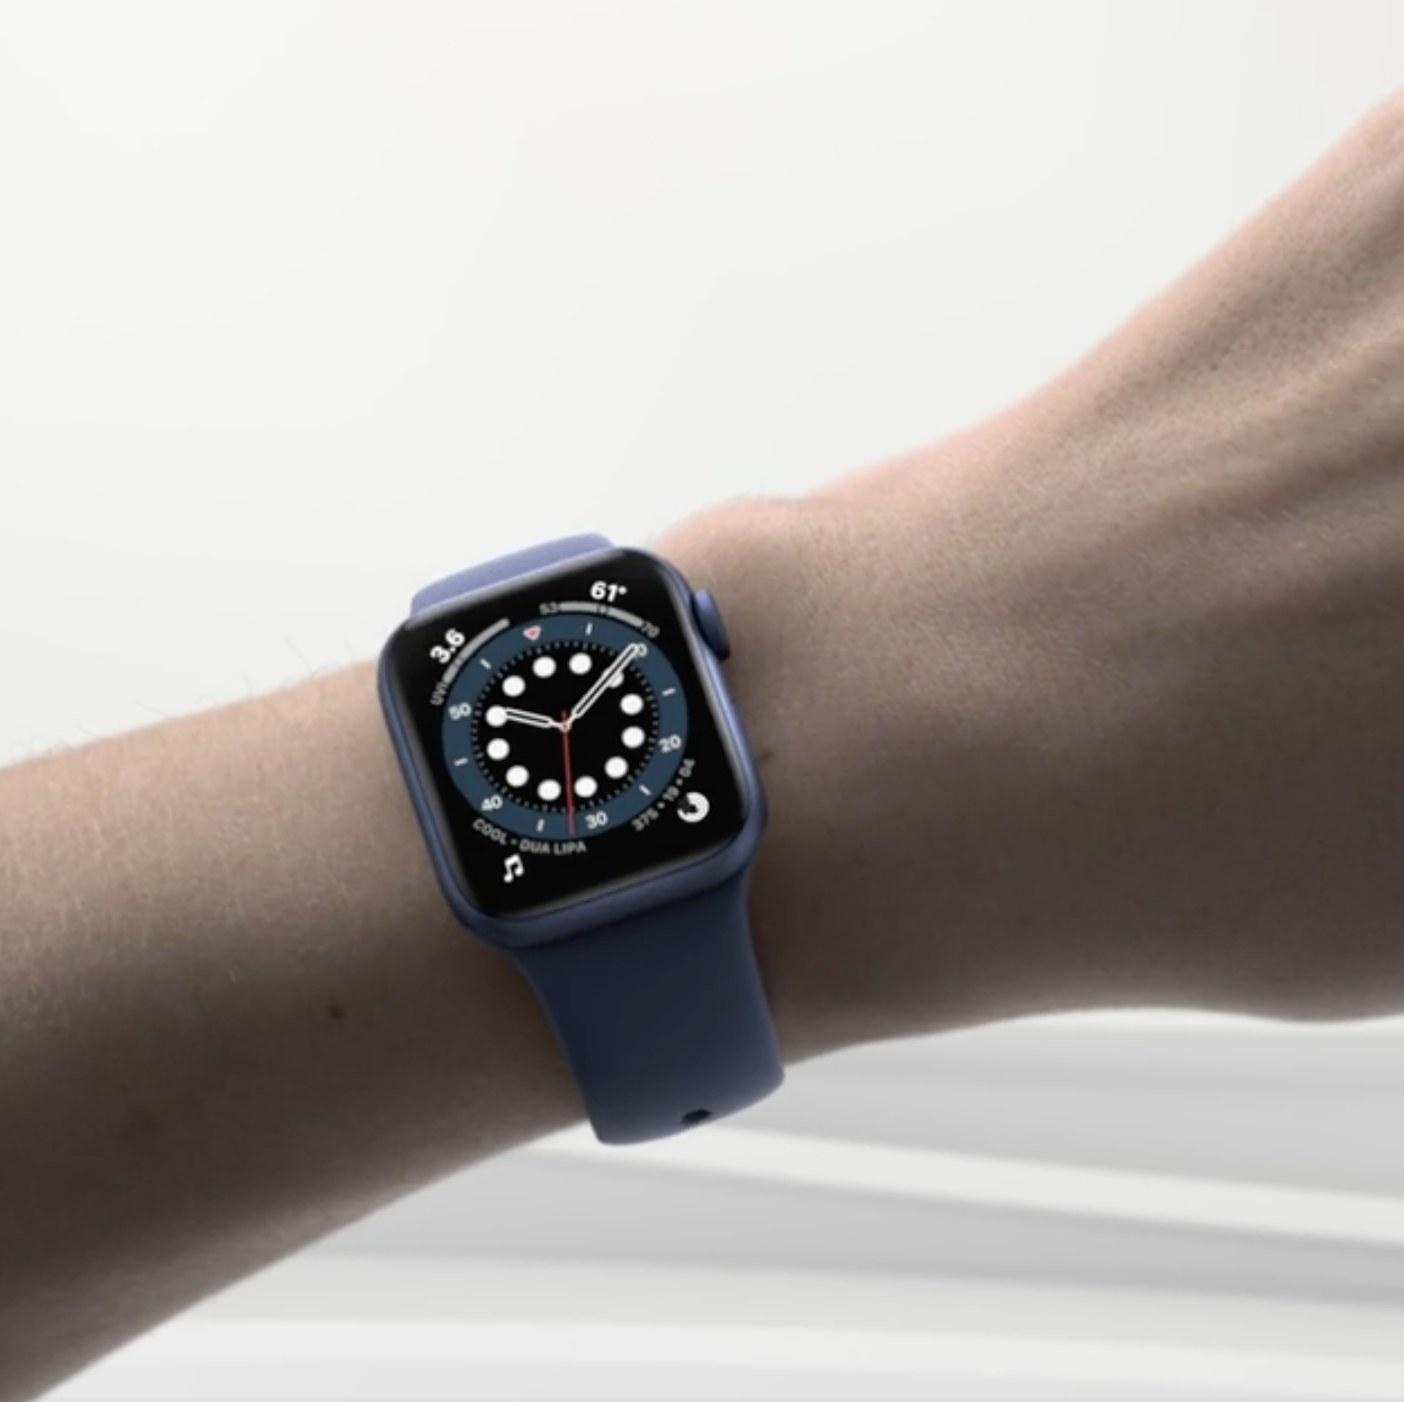 Person is wearing a blue Apple watch